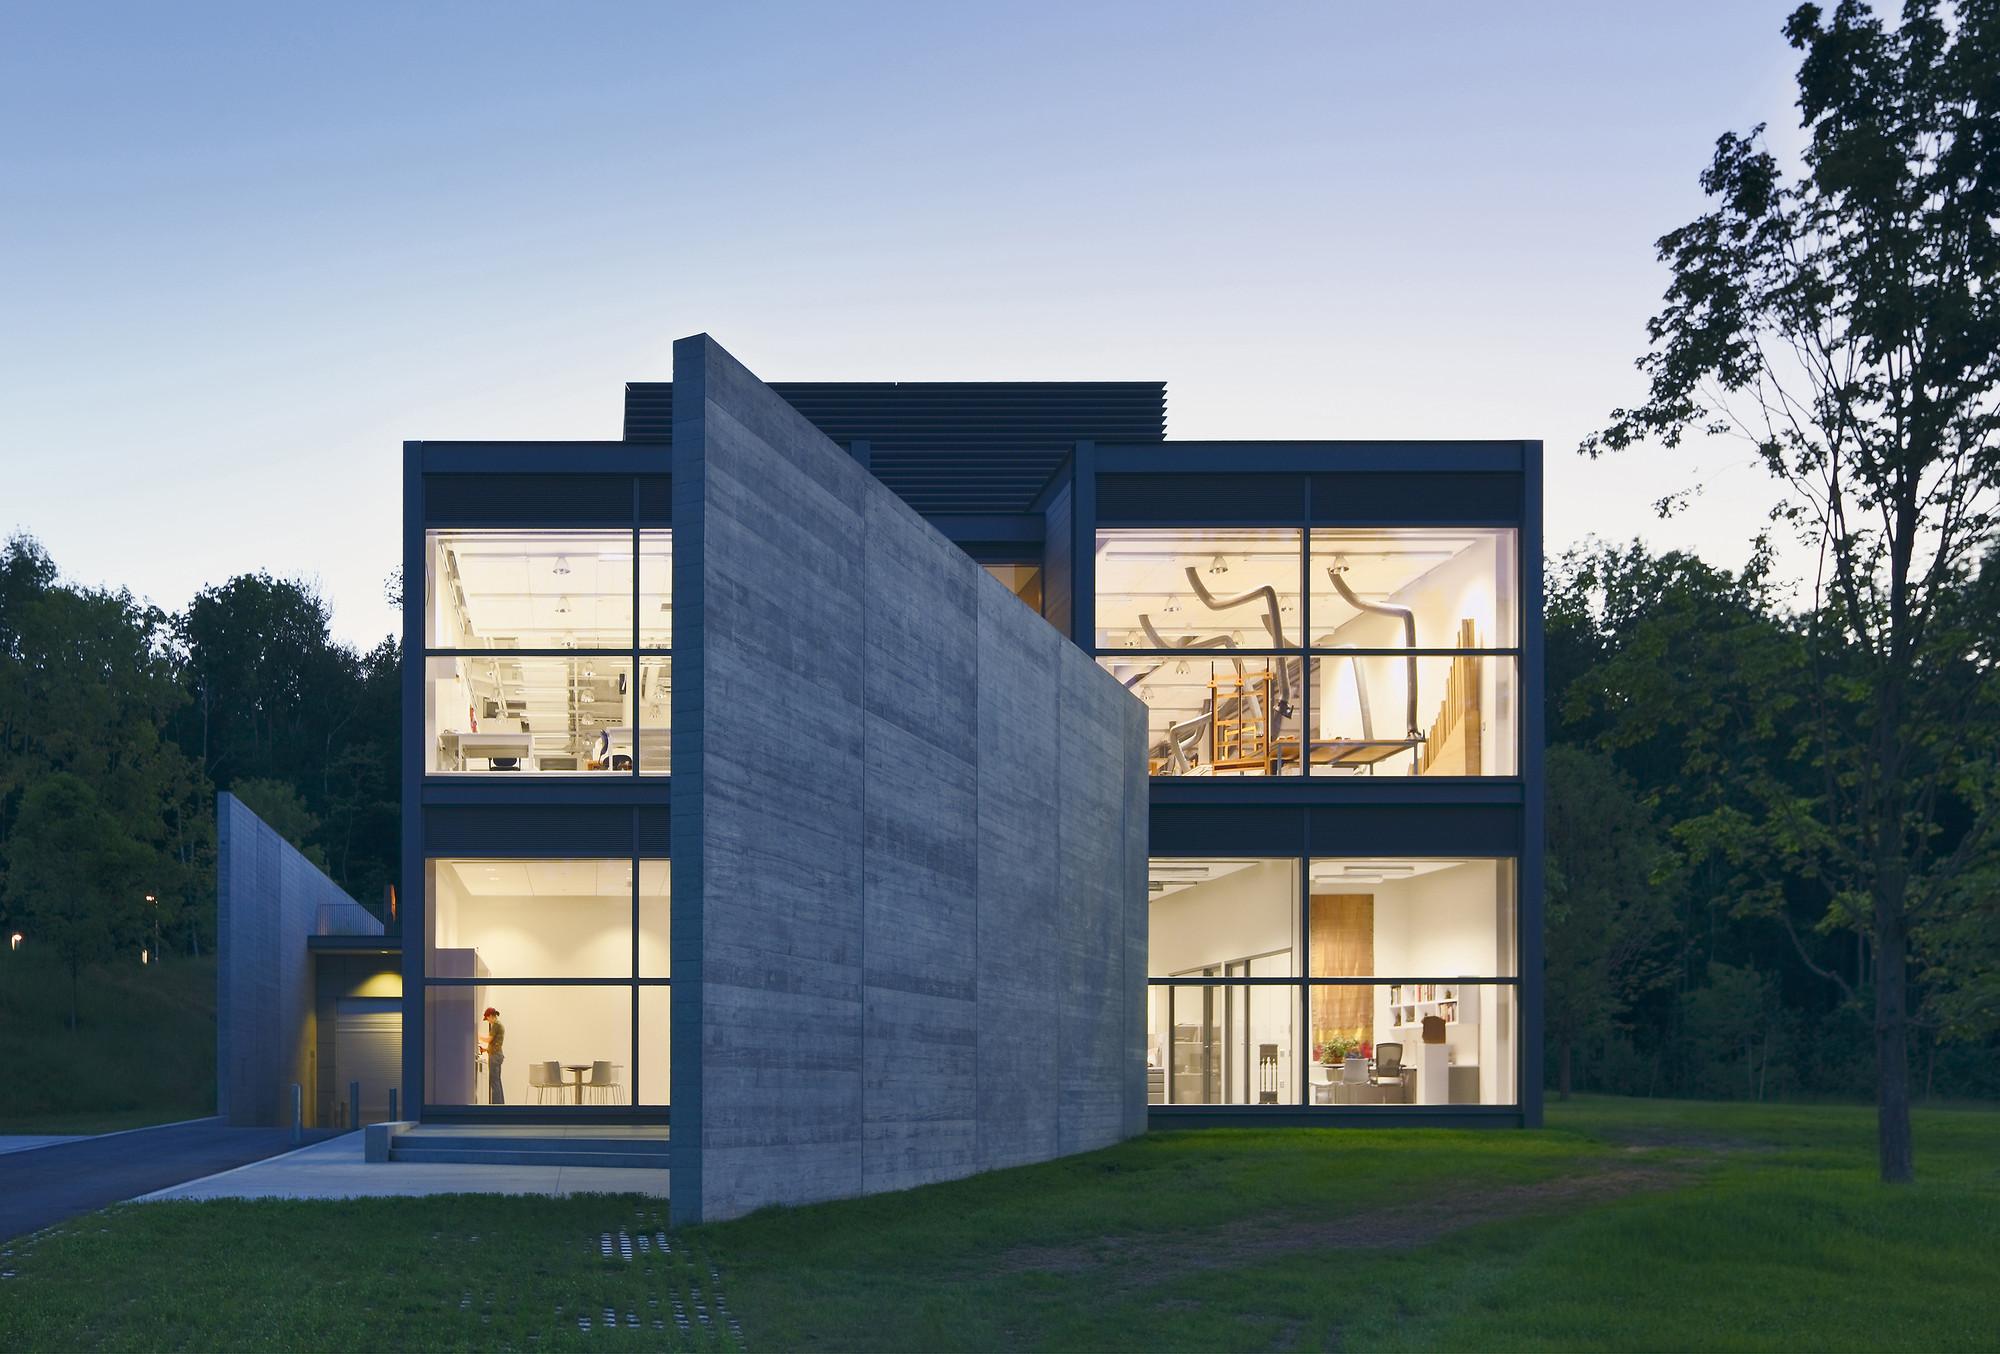 Clark Art Institute Tadao Ando Architect & Associates